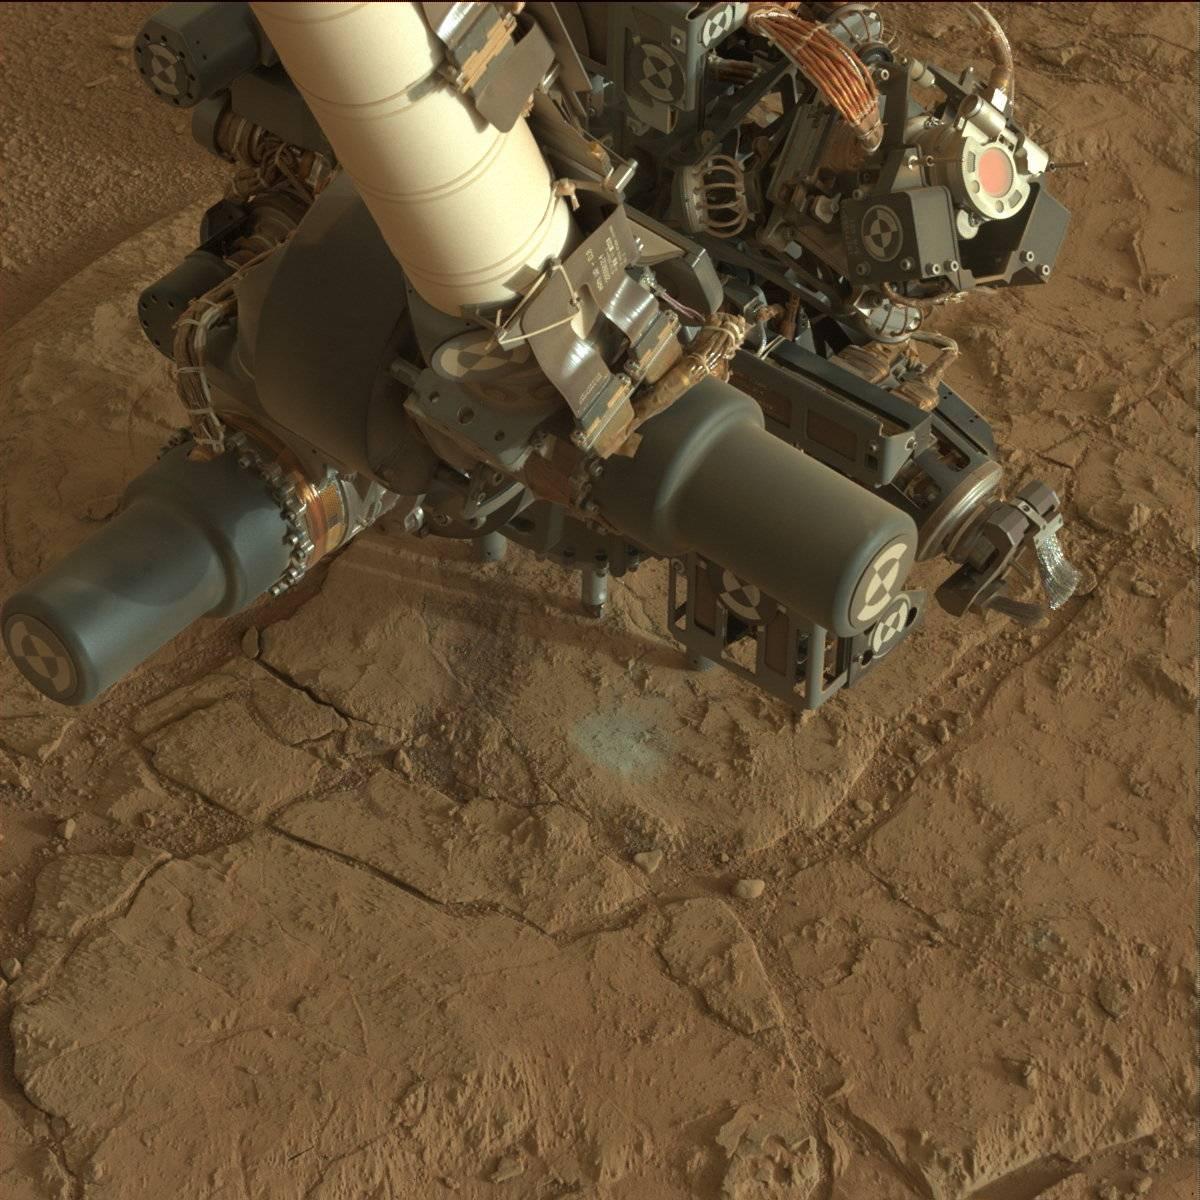 mars rover landing technique - photo #27